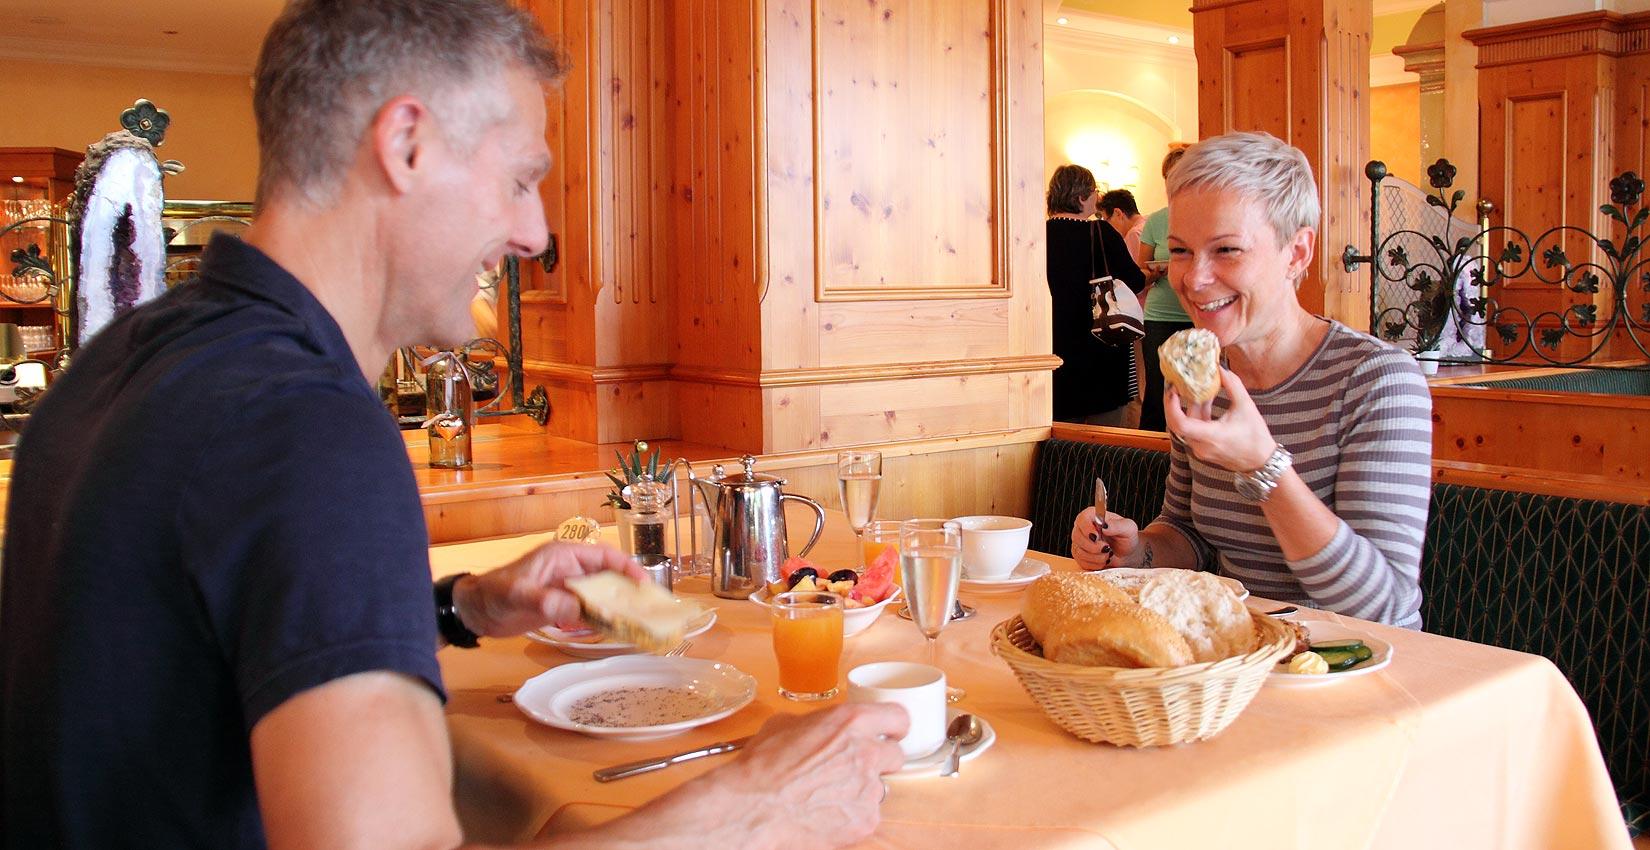 Hotel-Wohlfühl-Inklusivleistungen im Bergknappenhof Bodenmais